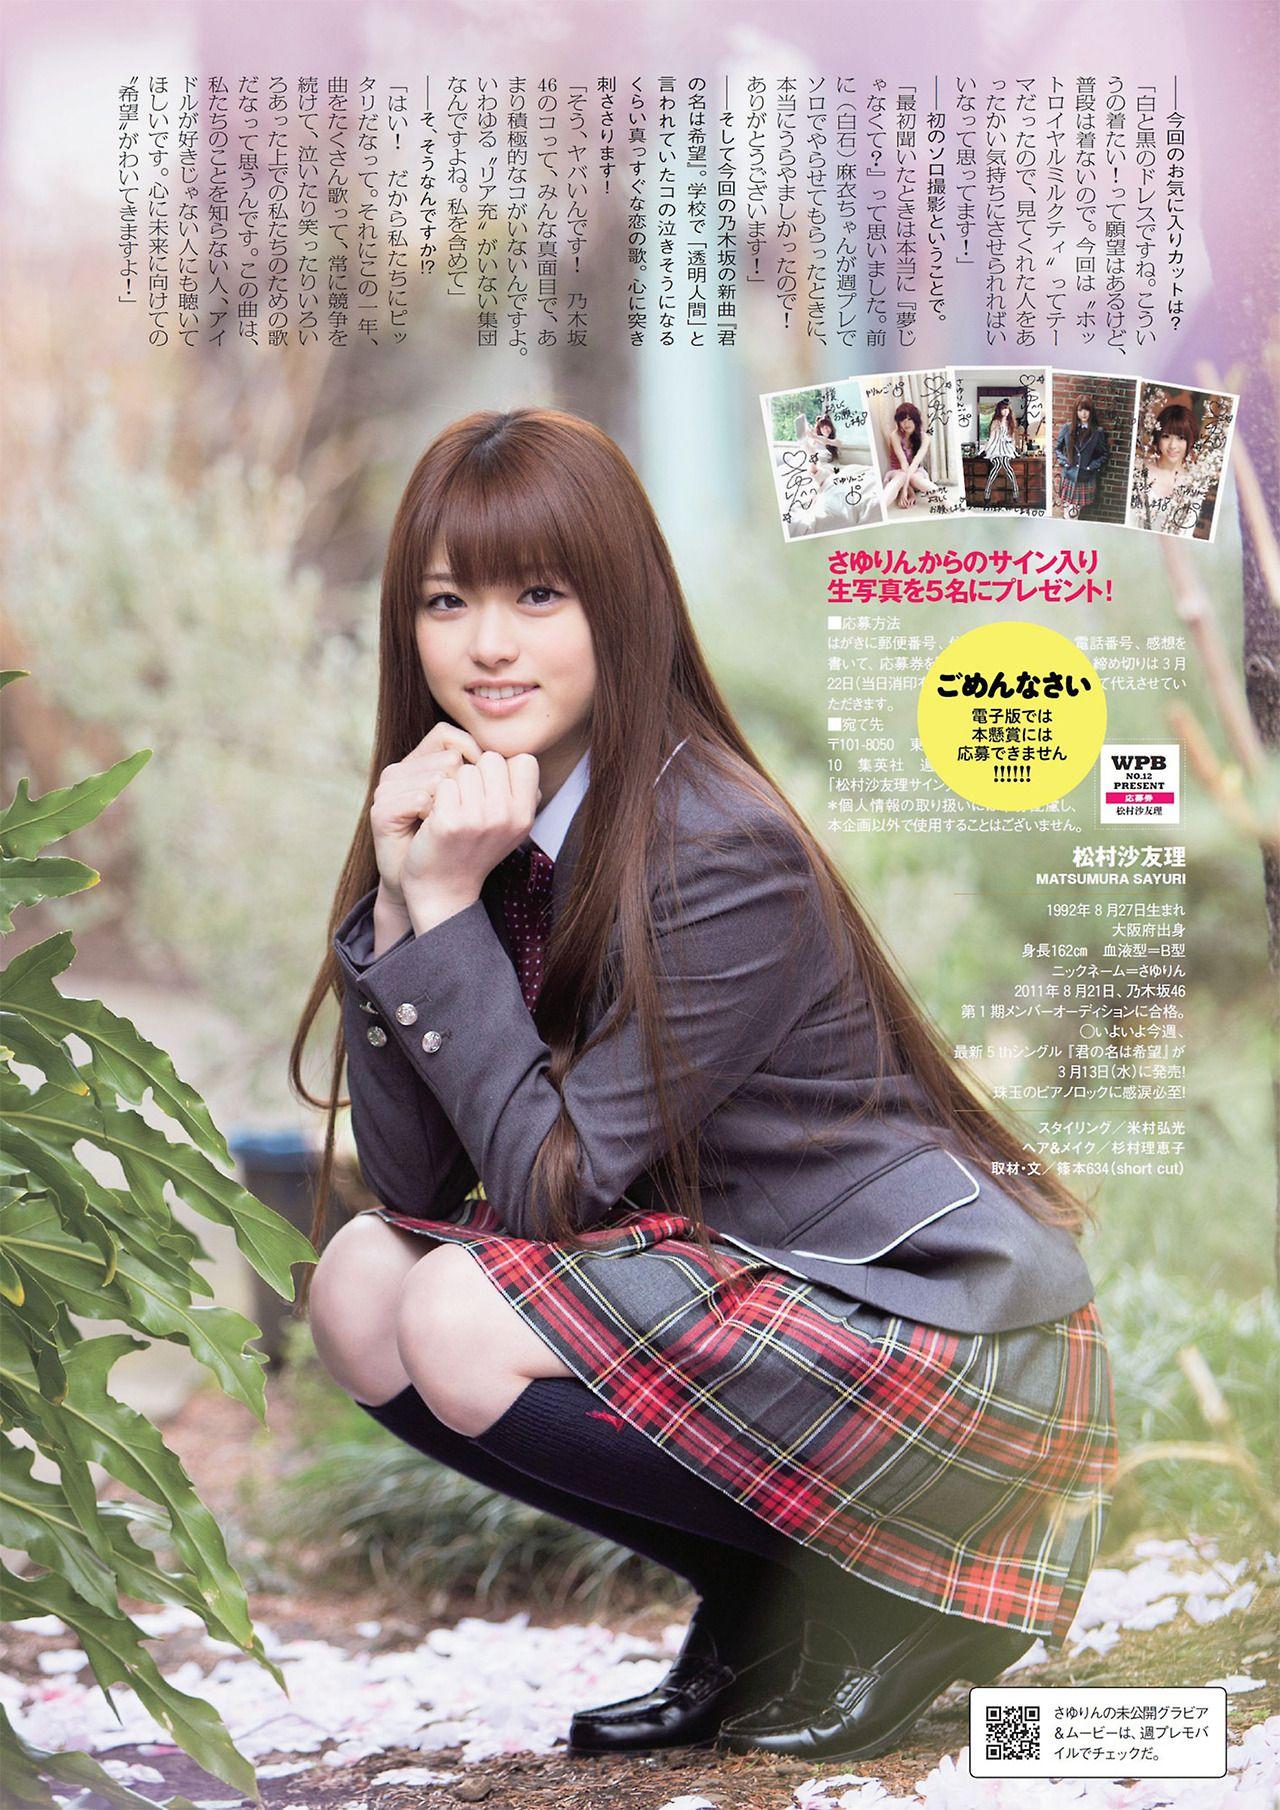 Weekly Playboy 2013 No.12 乃木坂46 (nogizaka46)  Matsumura Sayuri (松村沙友理)